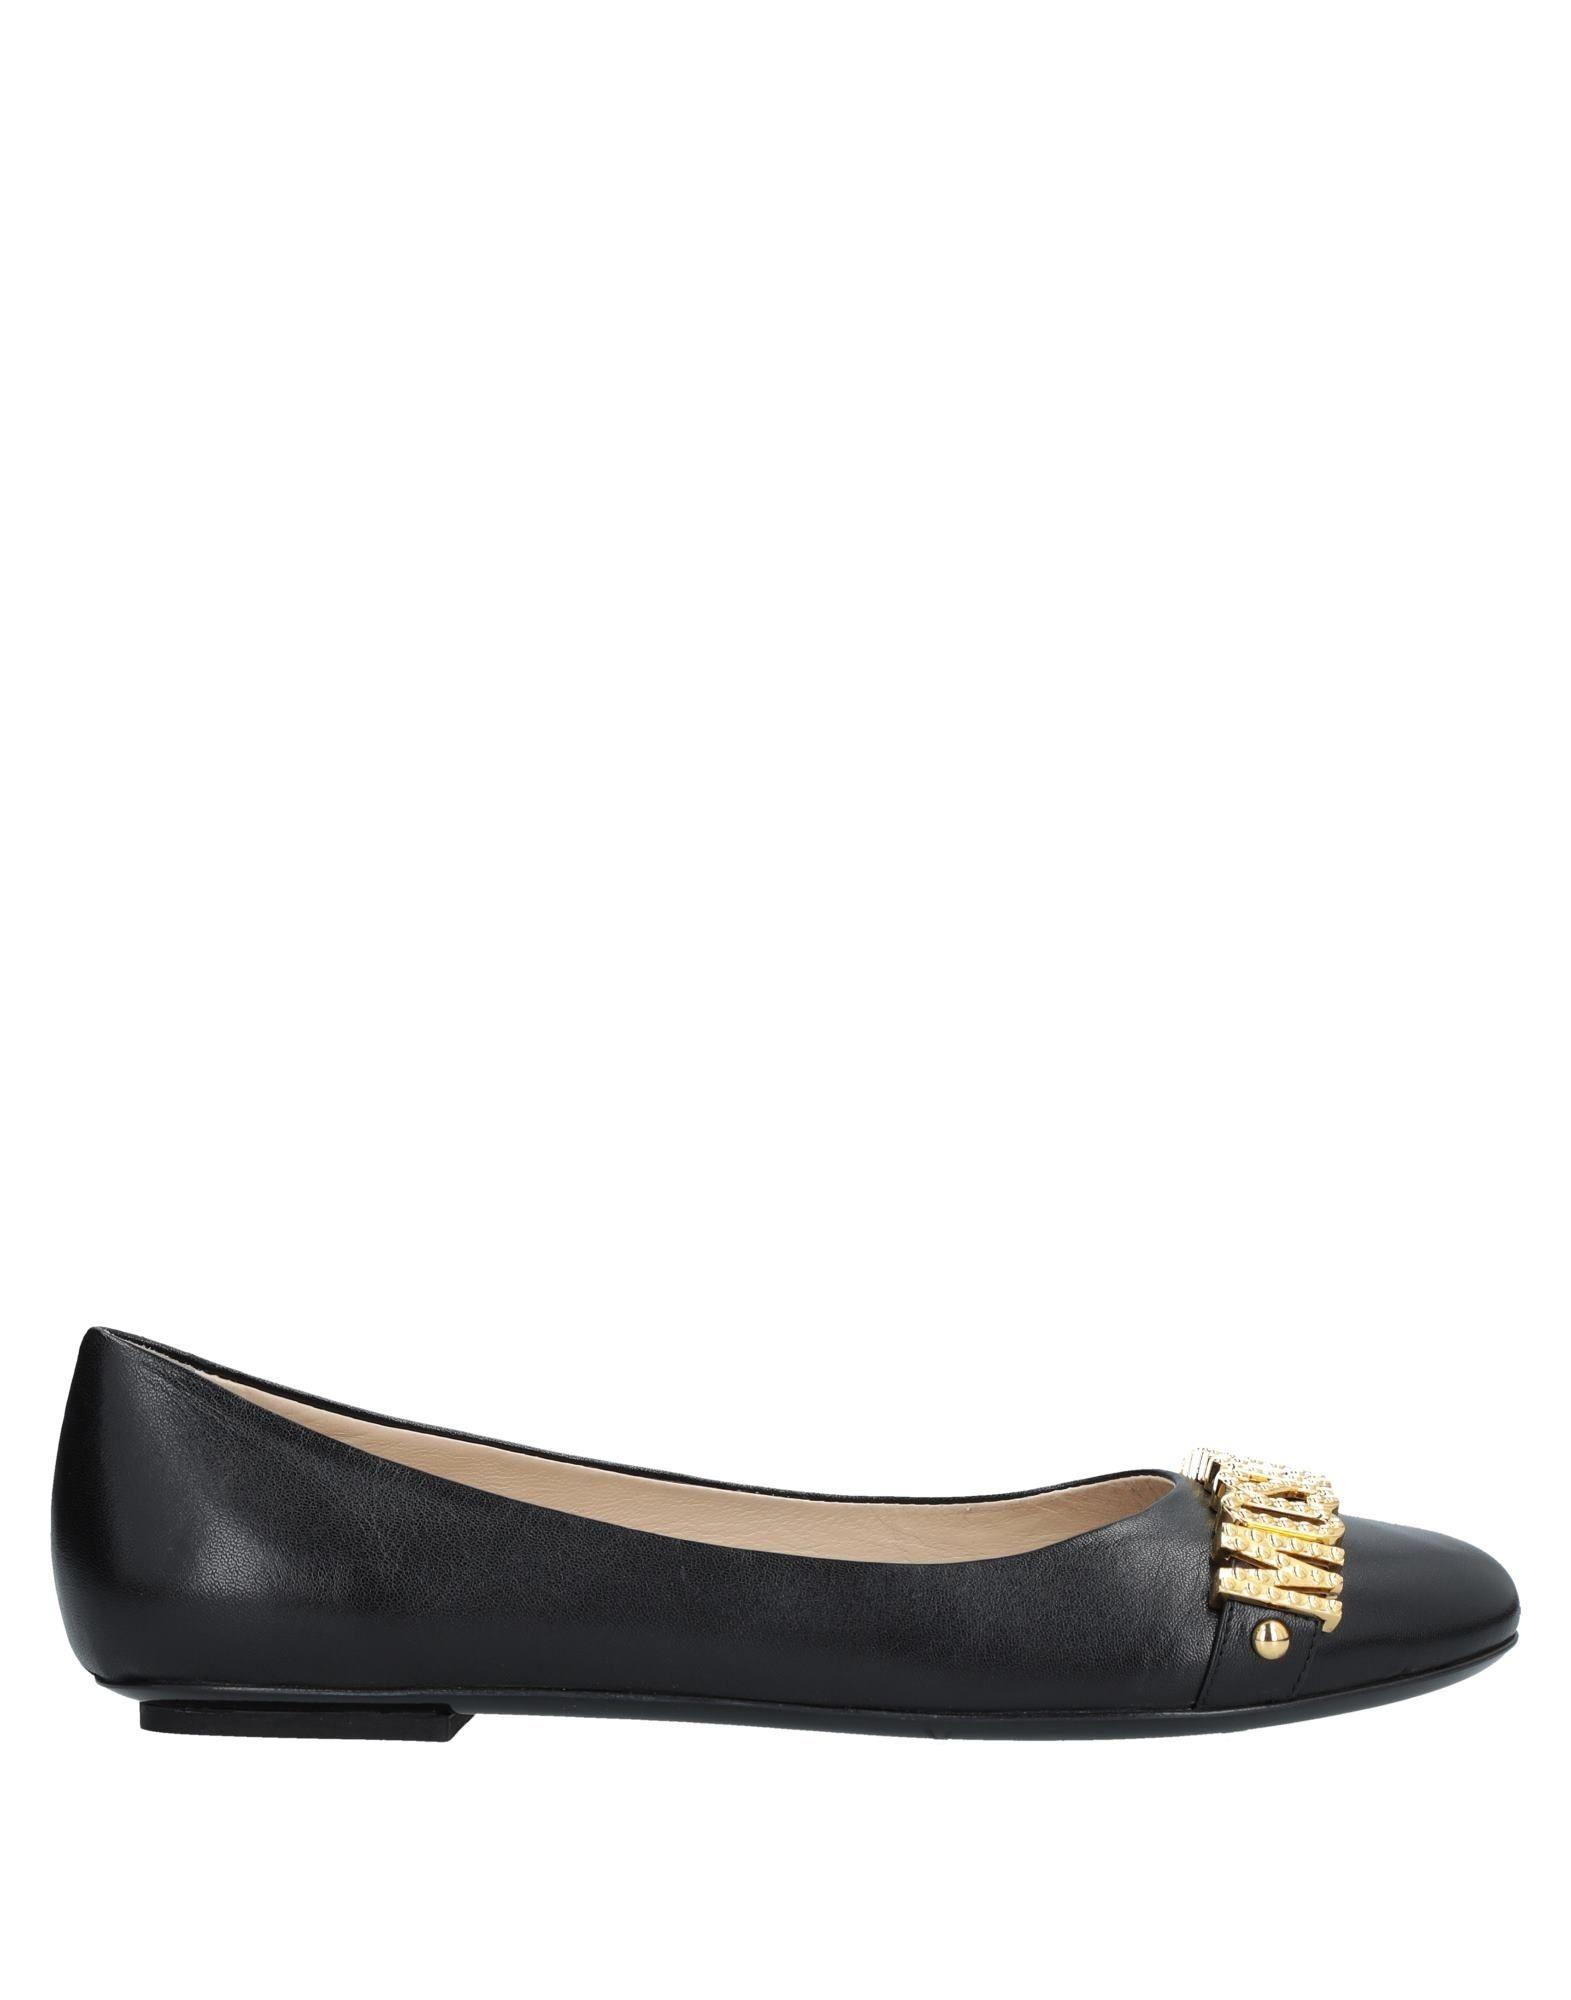 Rabatt Schuhe Moschino Ballerinas Damen  11535846BD